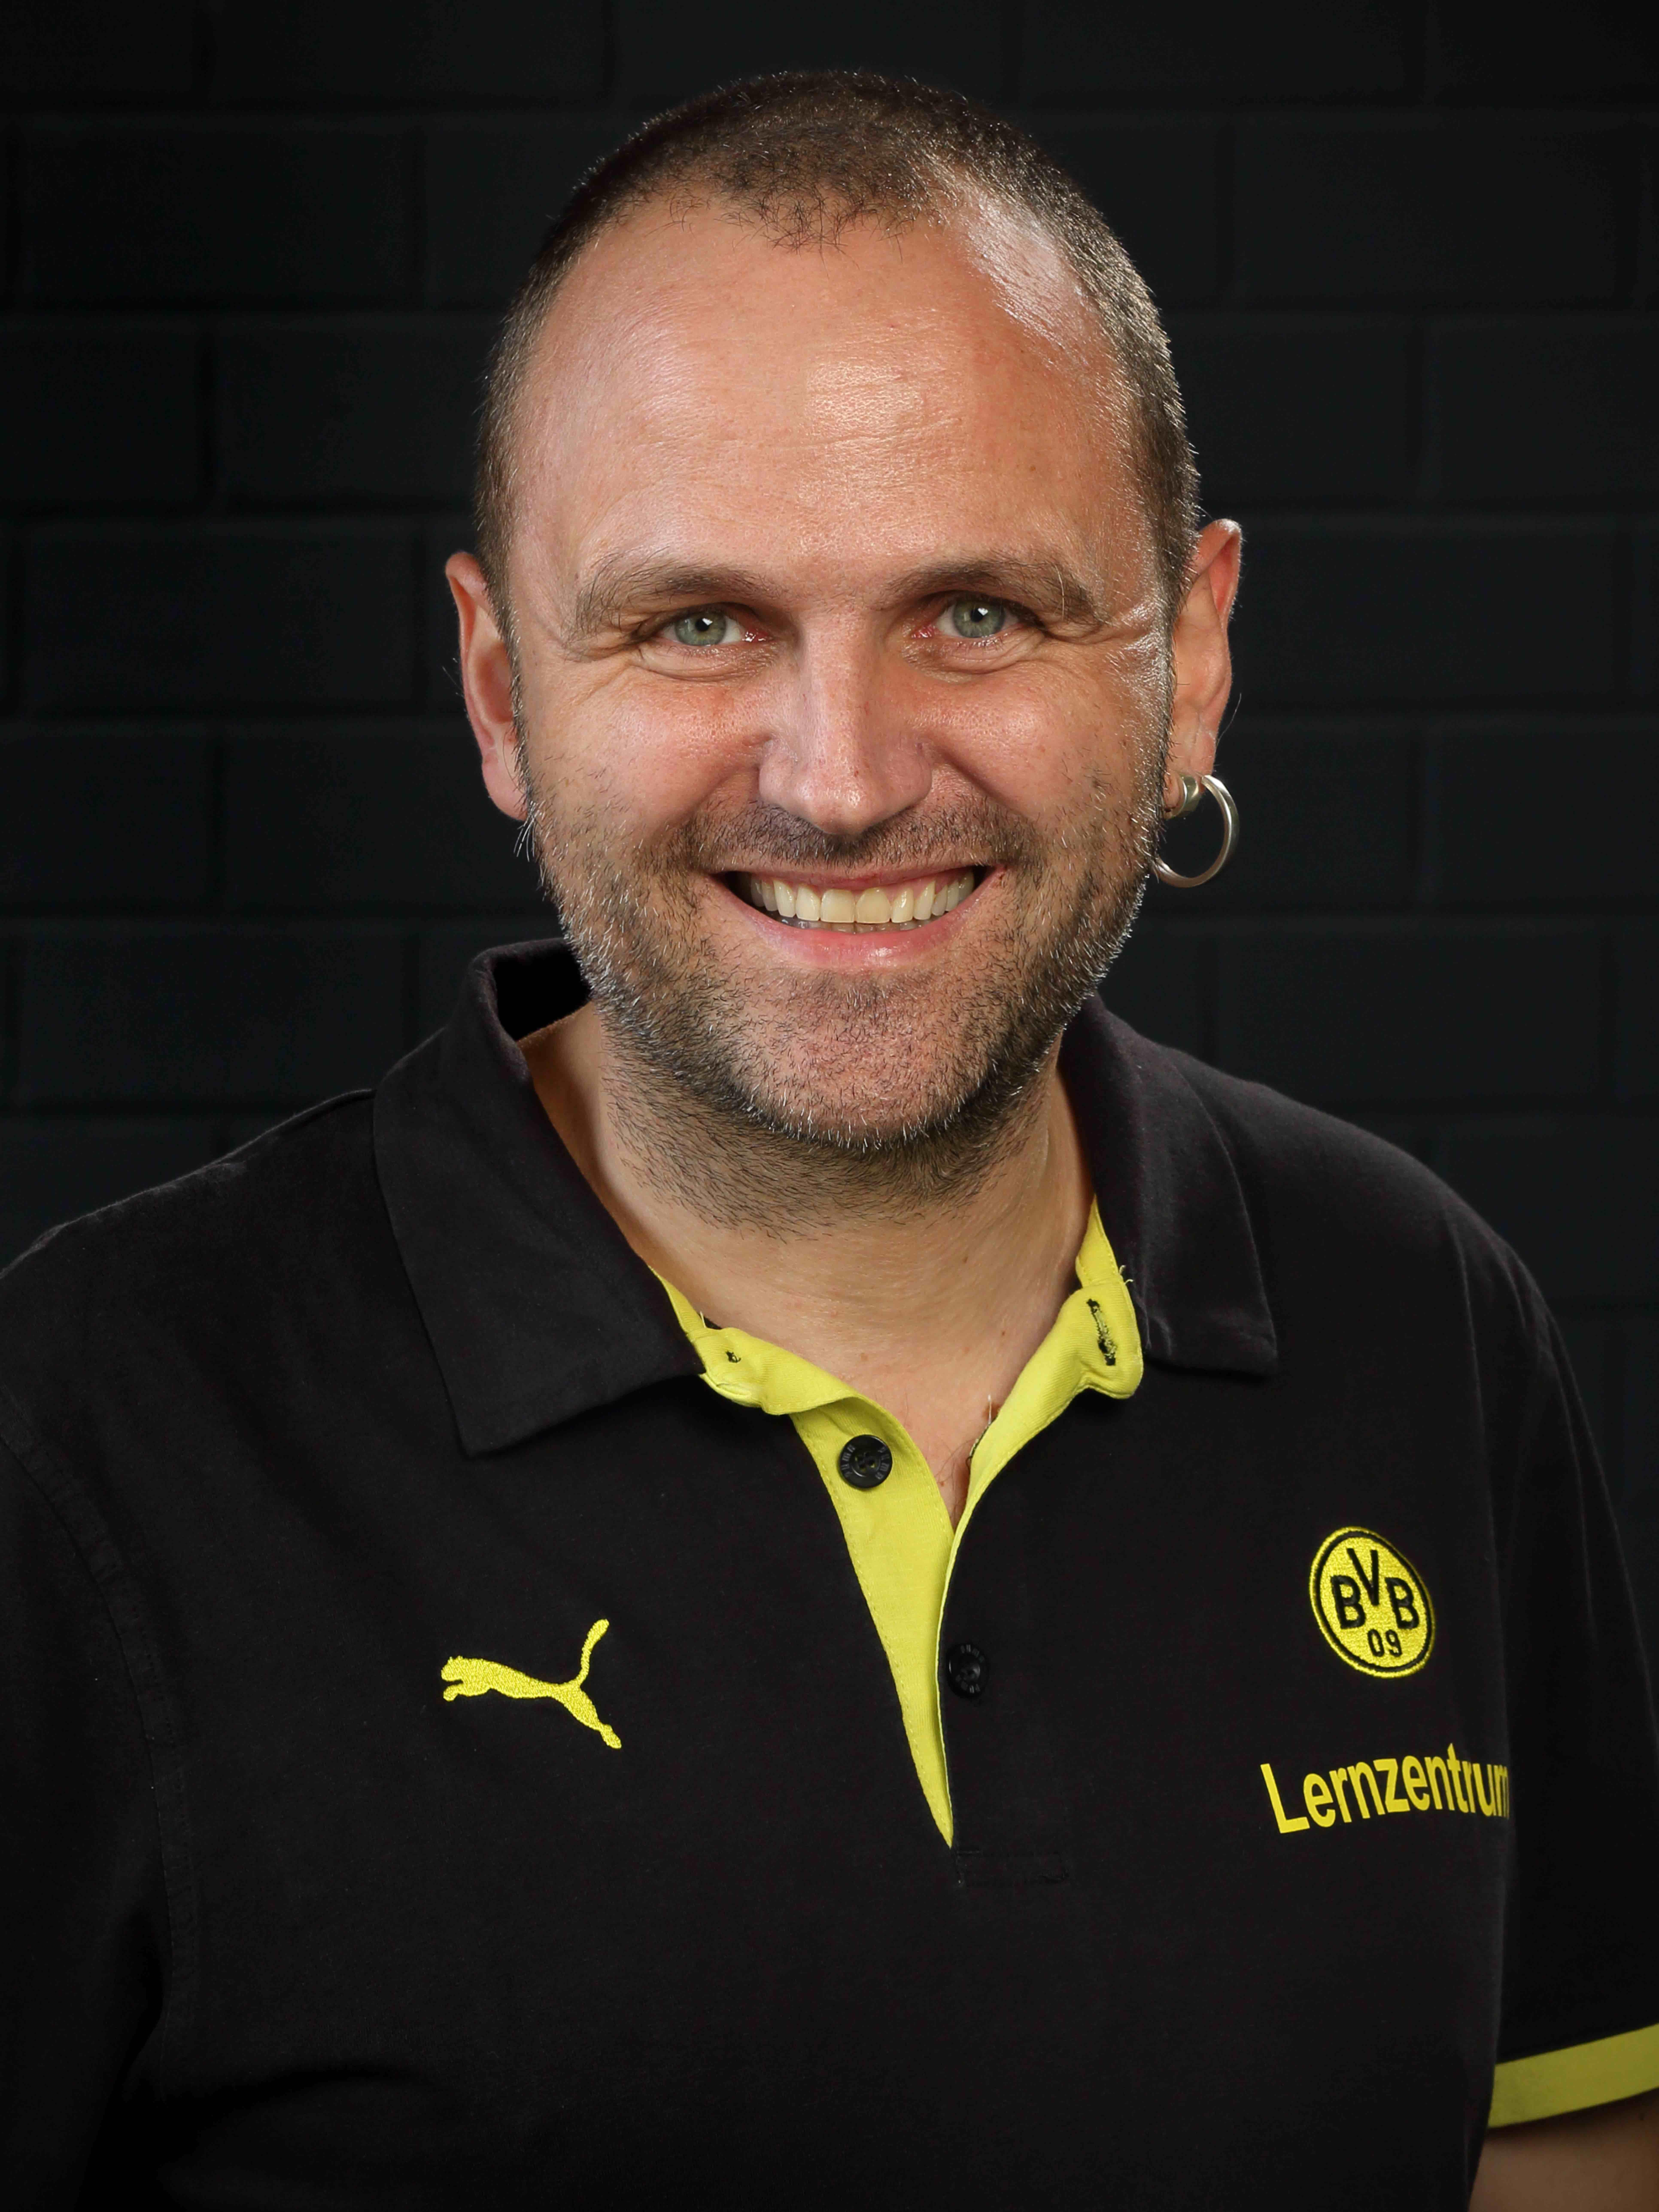 Johannes Böing